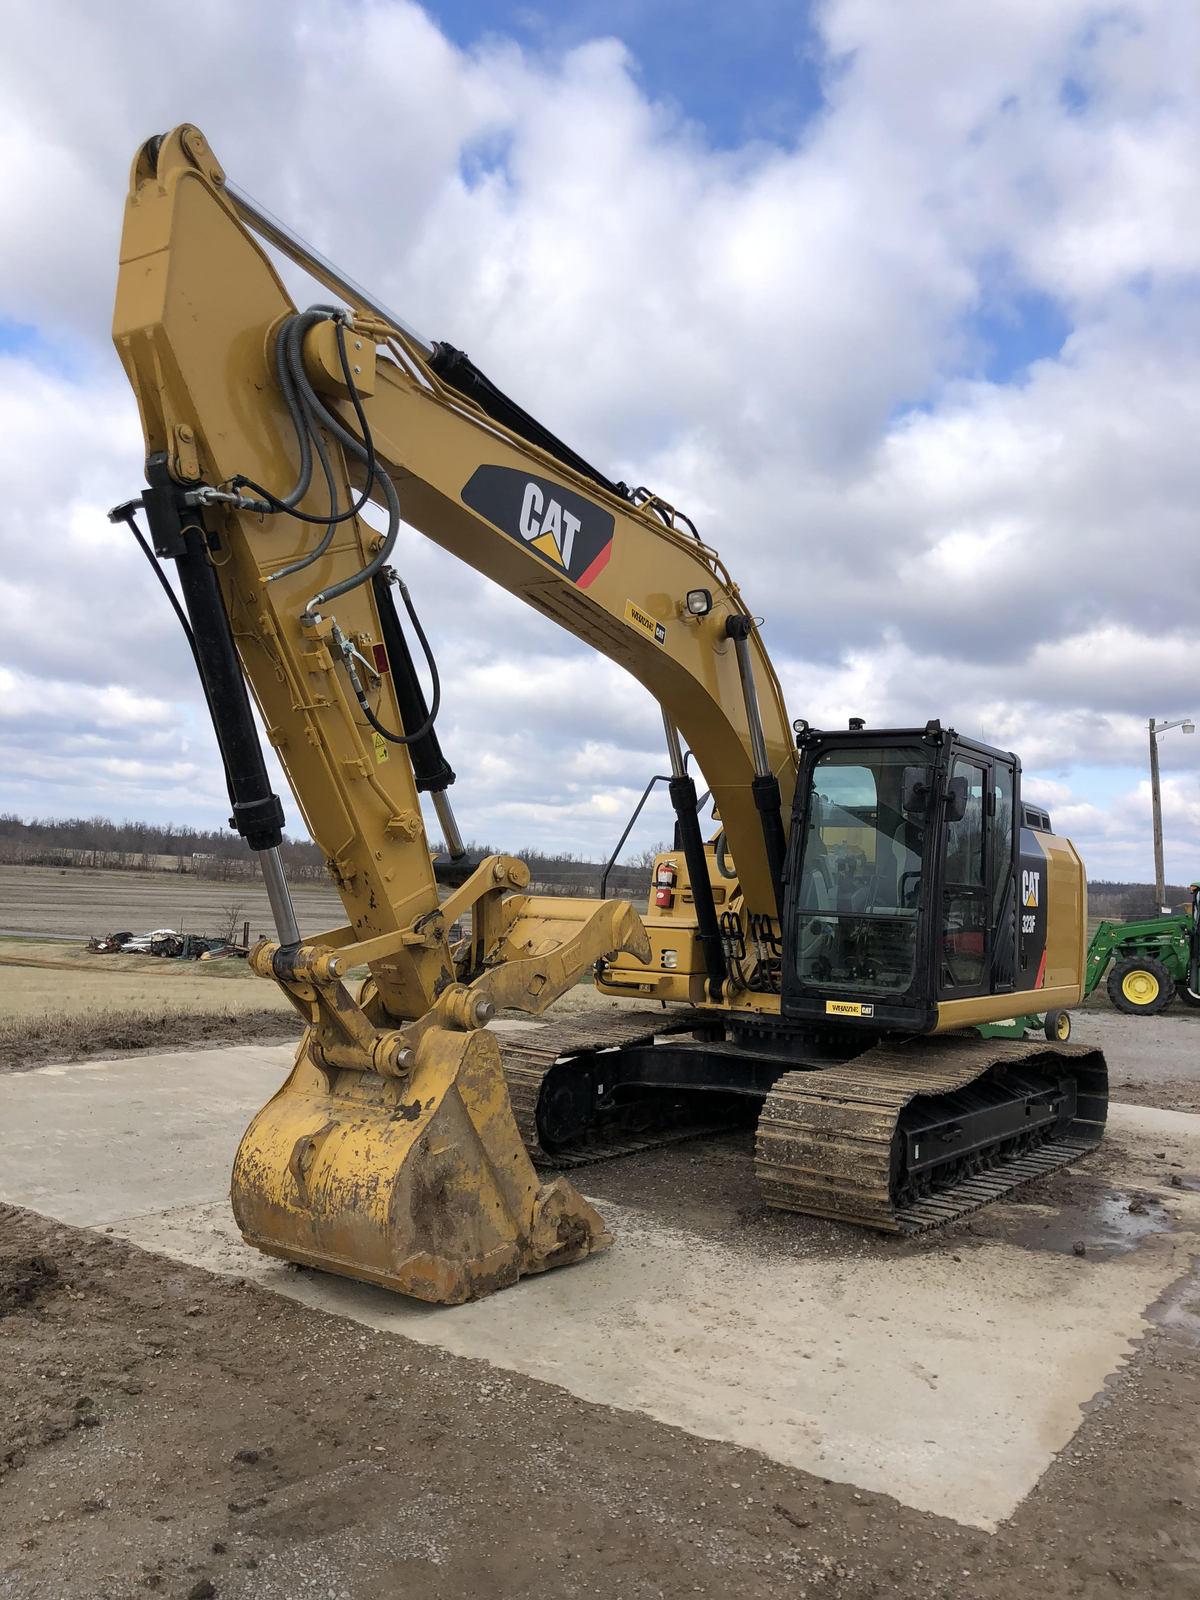 2017 Cat 323F Excavator FOR SALE IN Cunningham, KY 42035